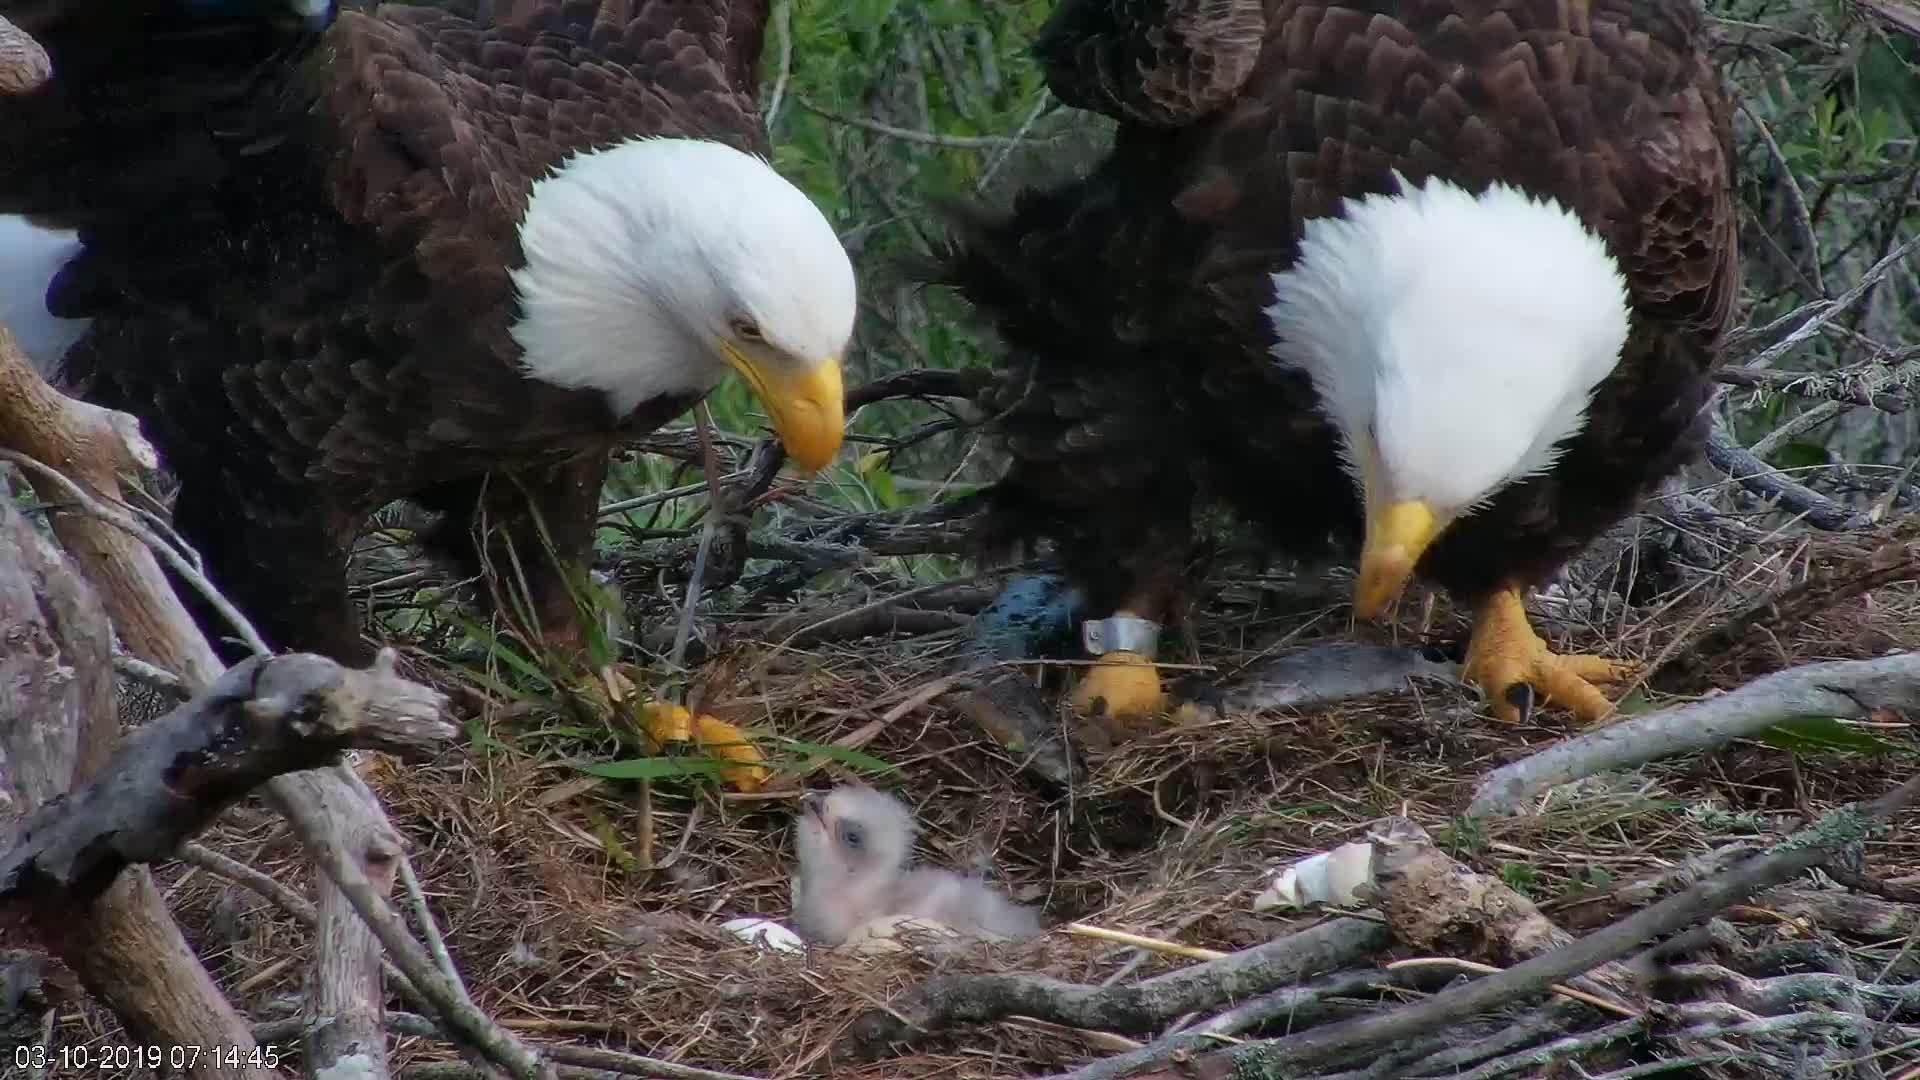 Fraser Point Bald Eagle Camera - Santa Cruz Island, California